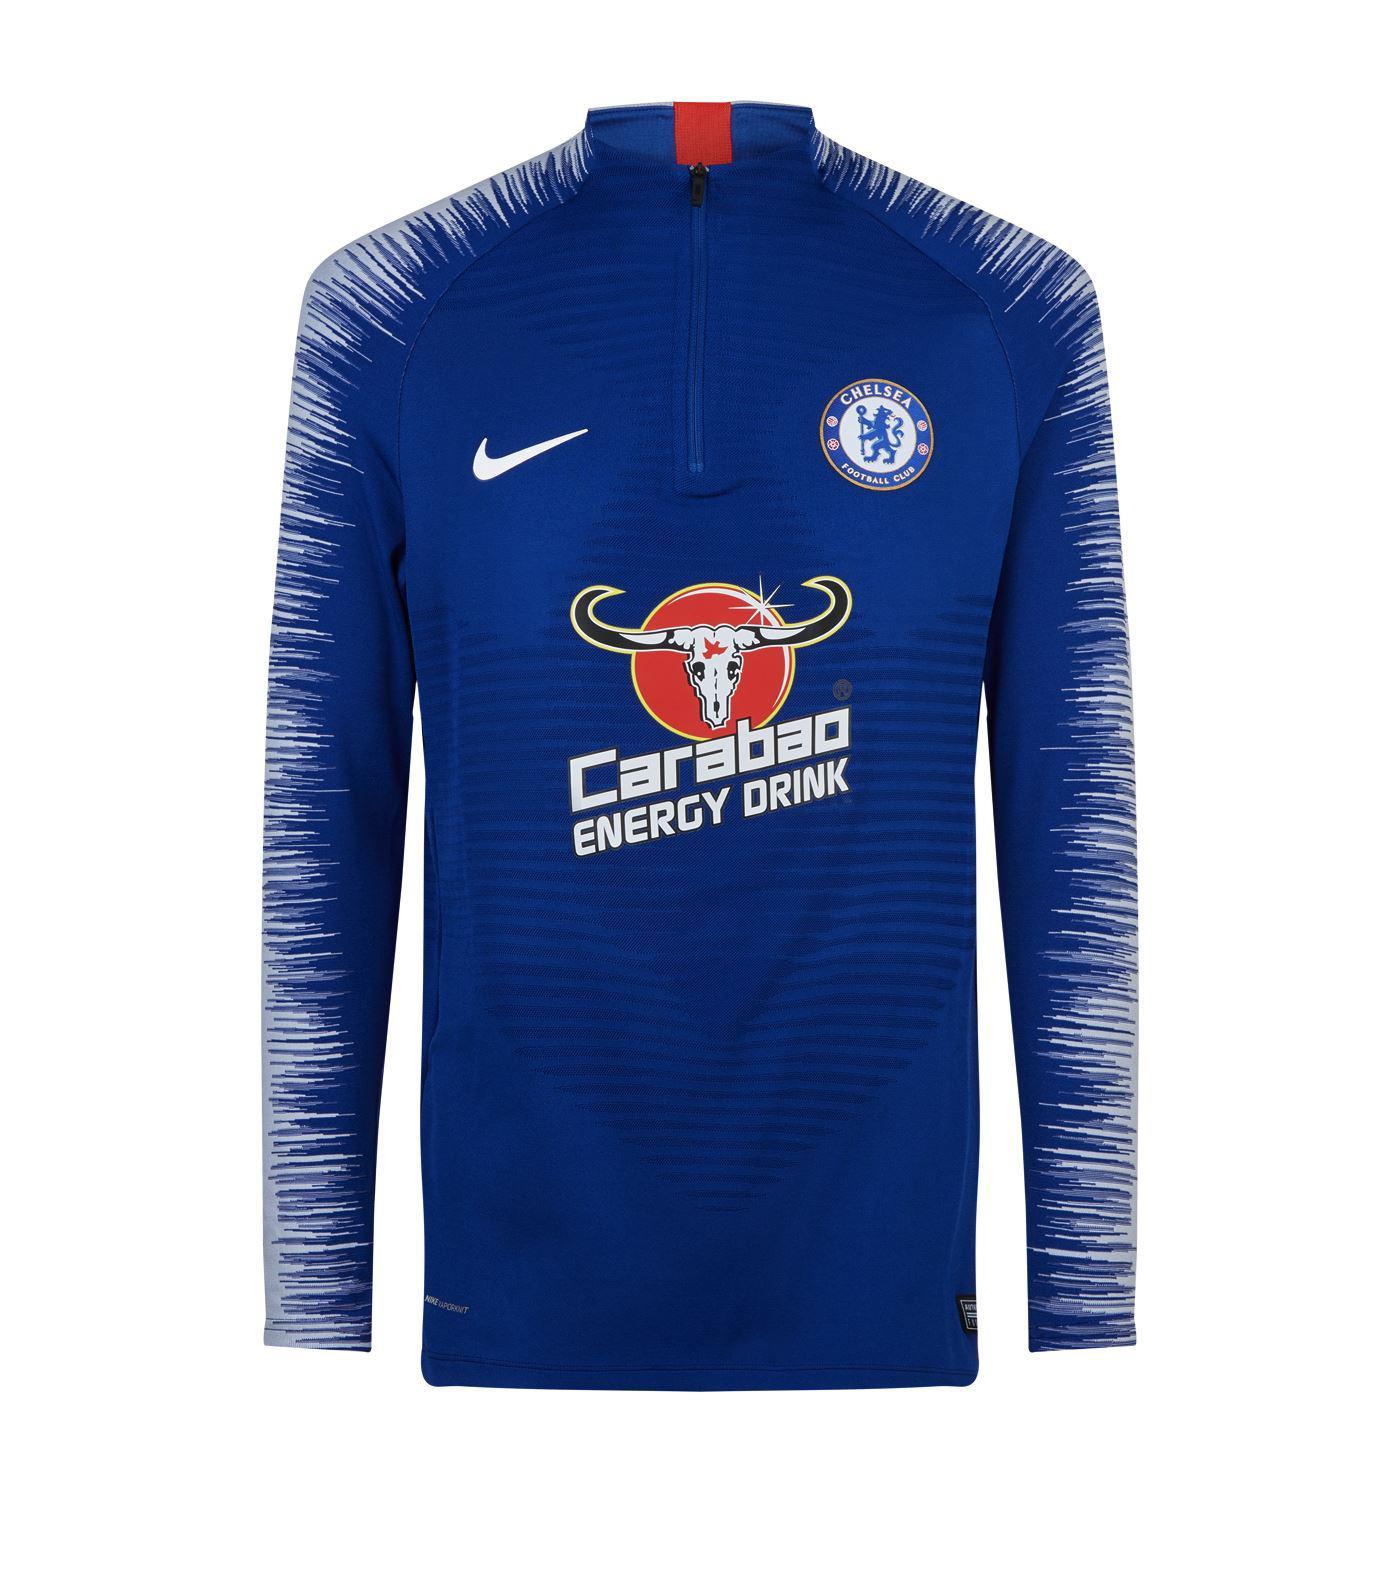 3c0a17f44 Nike Chelsea Football Club Zip Top in Blue for Men - Lyst